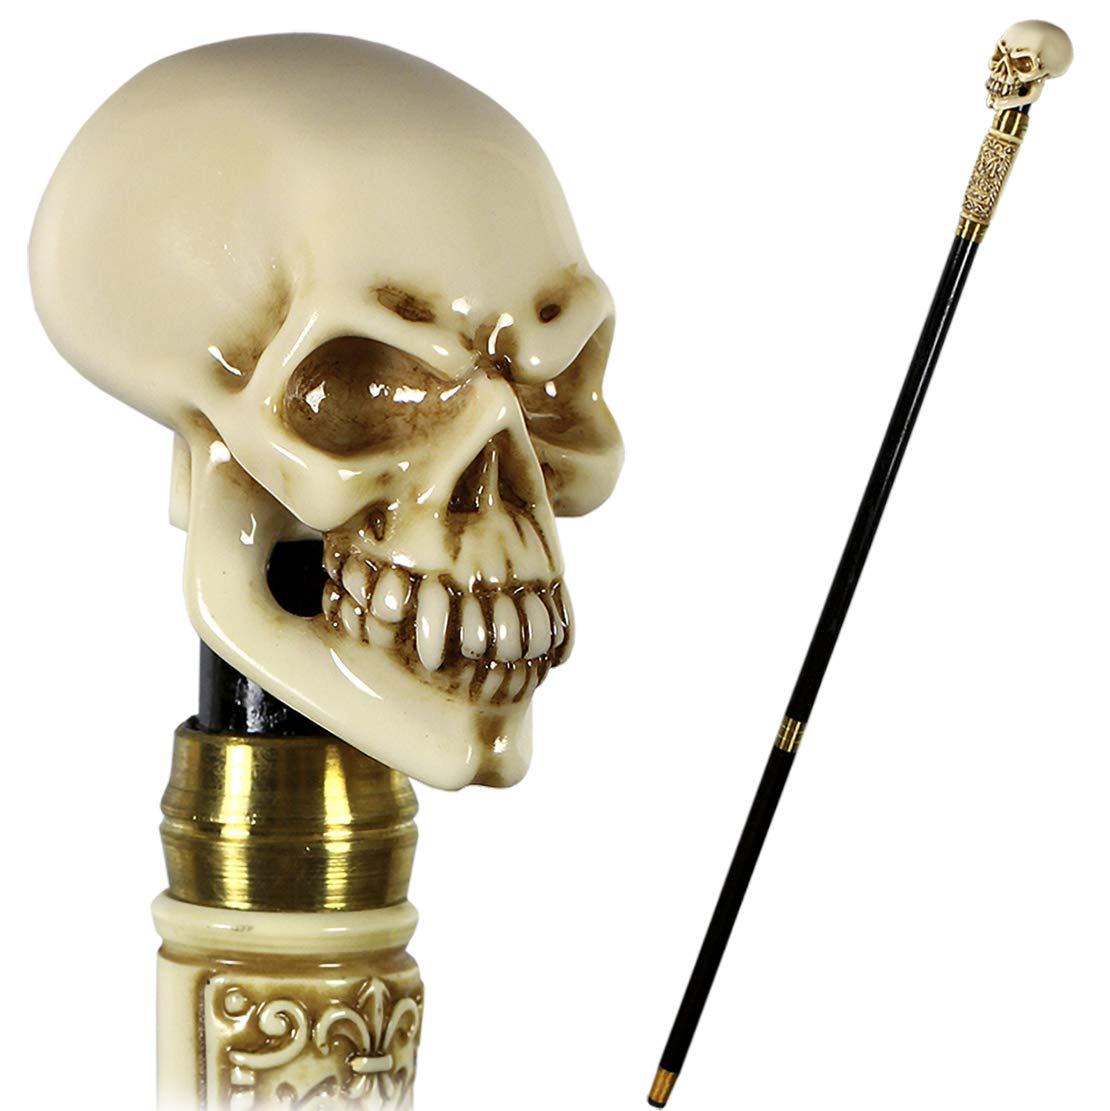 GC-Artis Halloween Steampunk Skull Walking Stick Cane Gothic Style Knob Handle Black Wooden Shaft Folding 36'' by GC-Artis